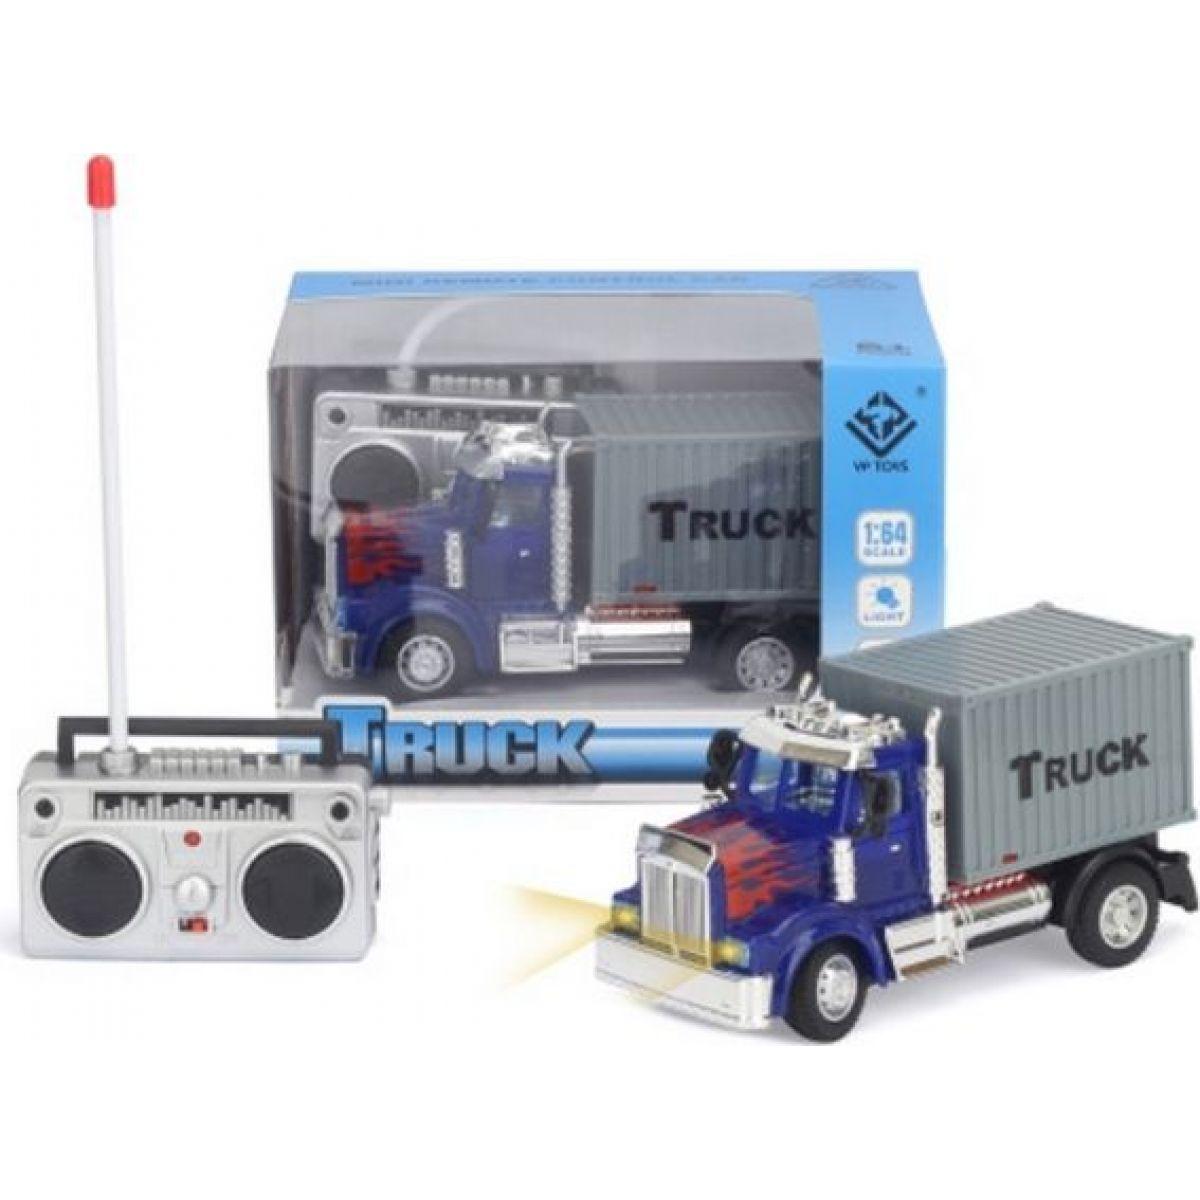 Auto truck RC 1:64